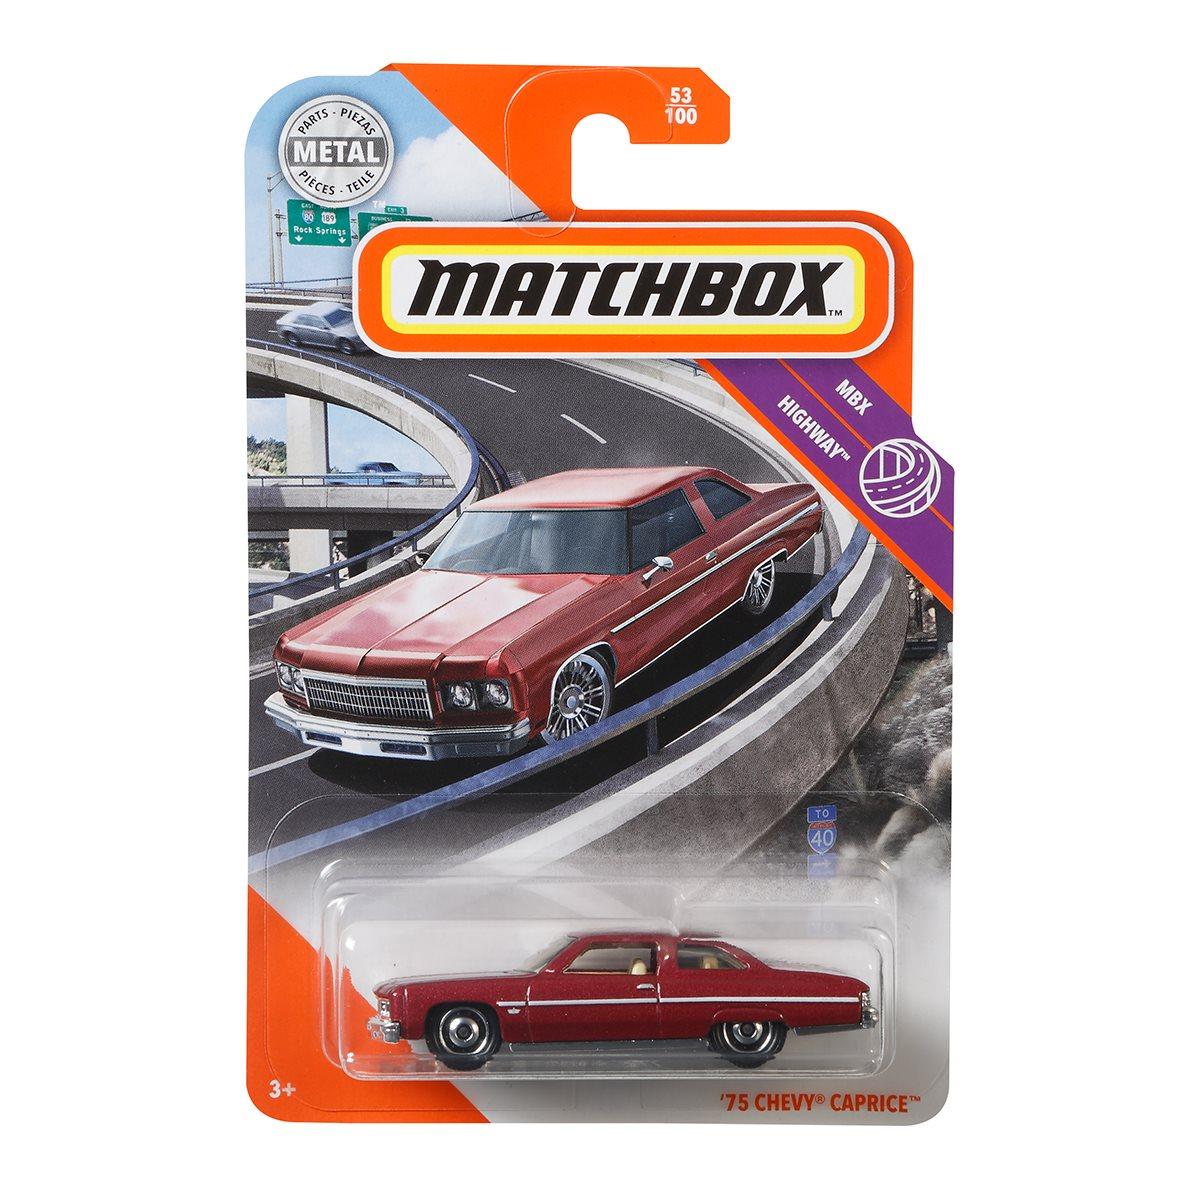 MATCHBOX 75 CHEVY CAPRICE MBX HIGHWAY 53//100 1:64 2019 Mattel